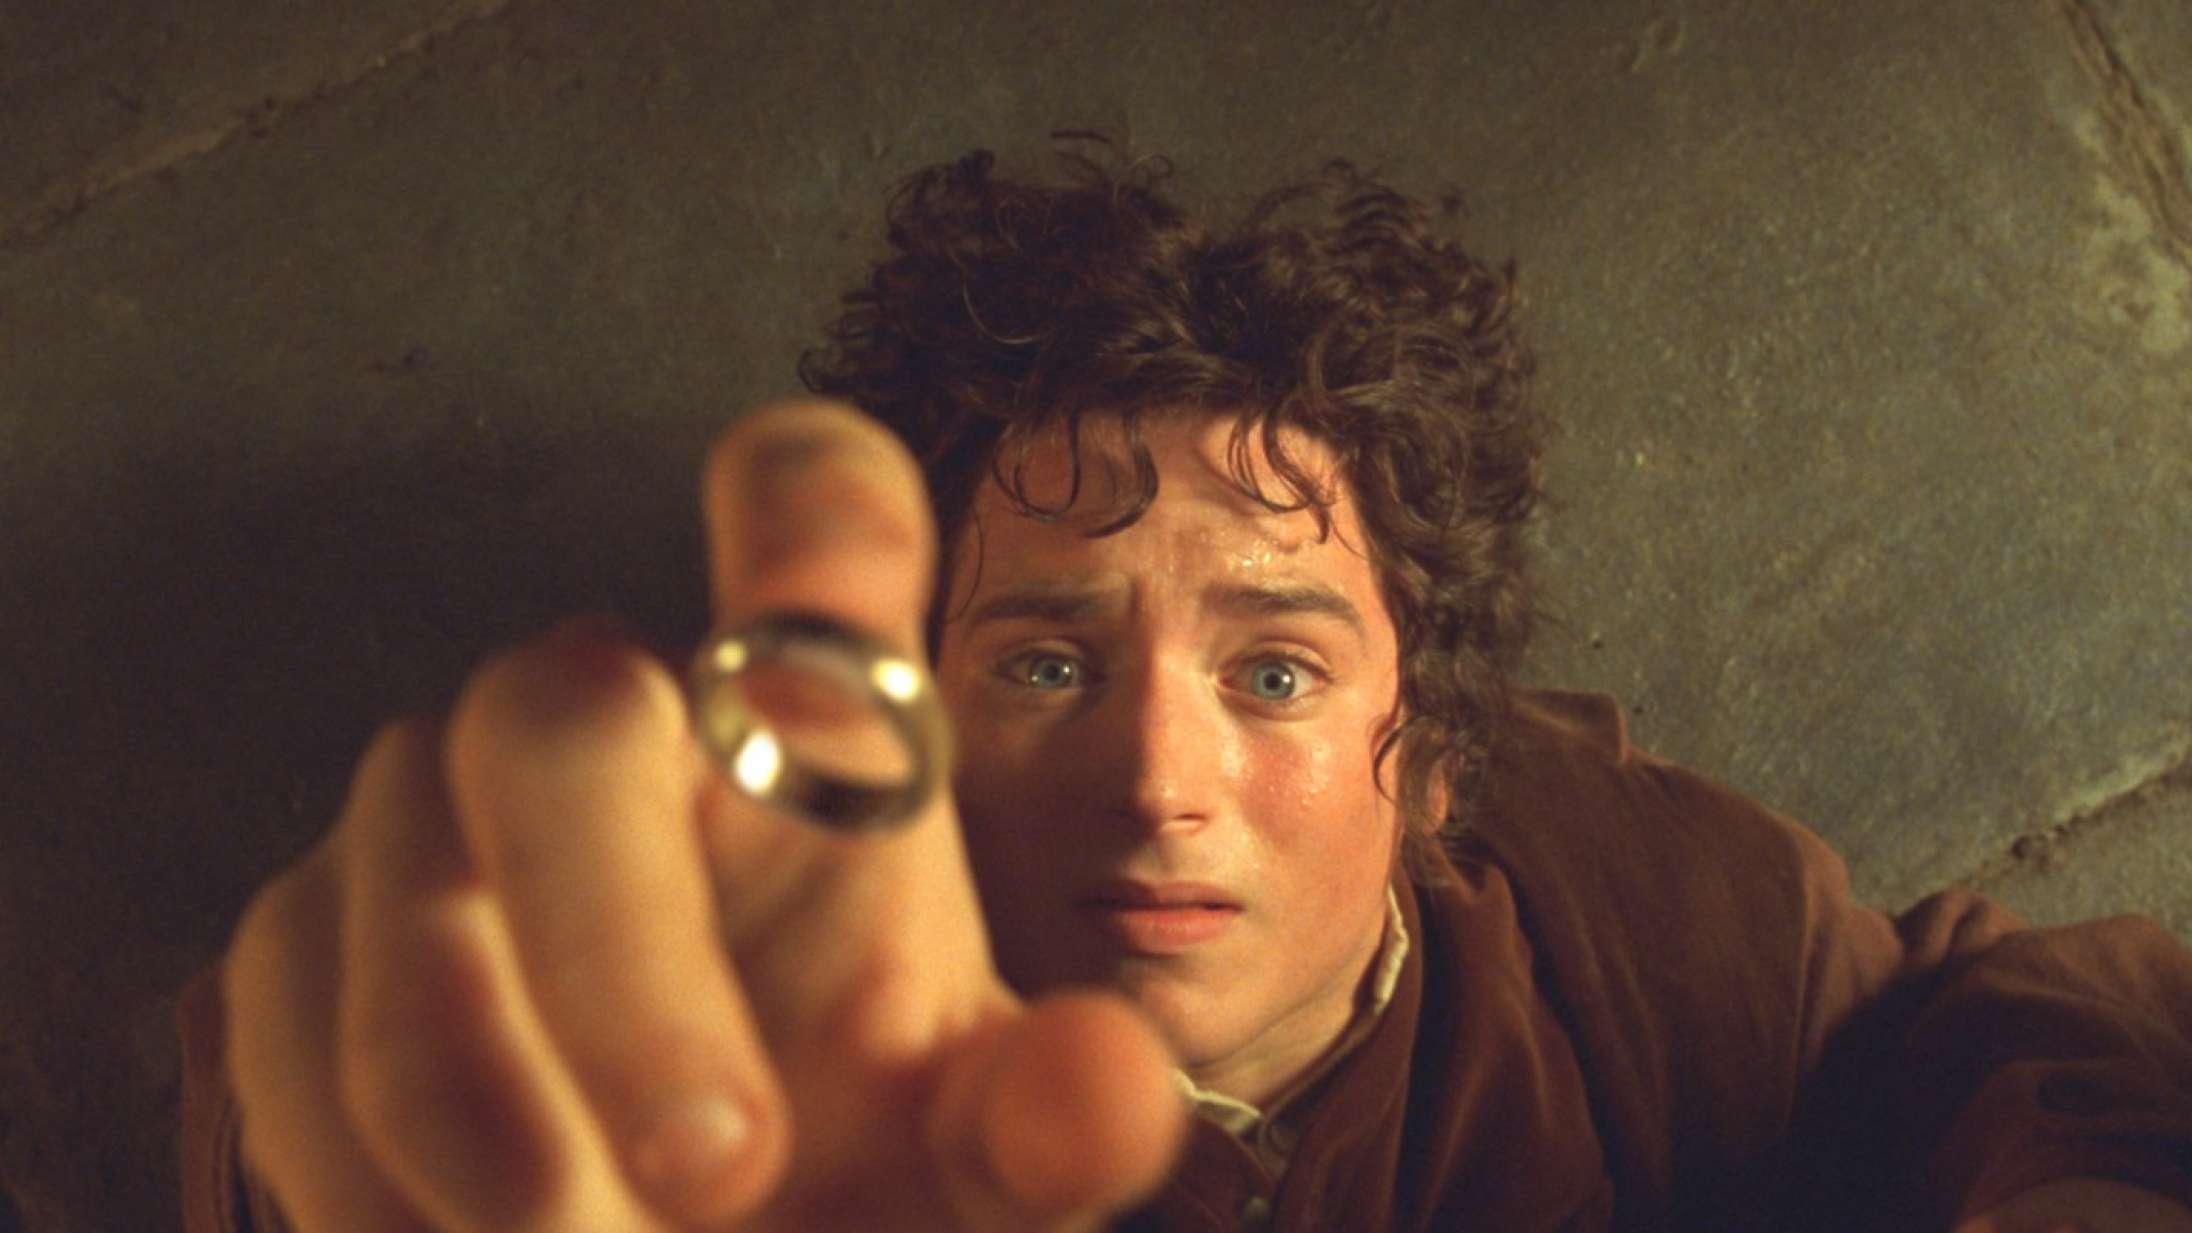 Amazons 'Ringenes herre'-serie har fået officiel premieredato